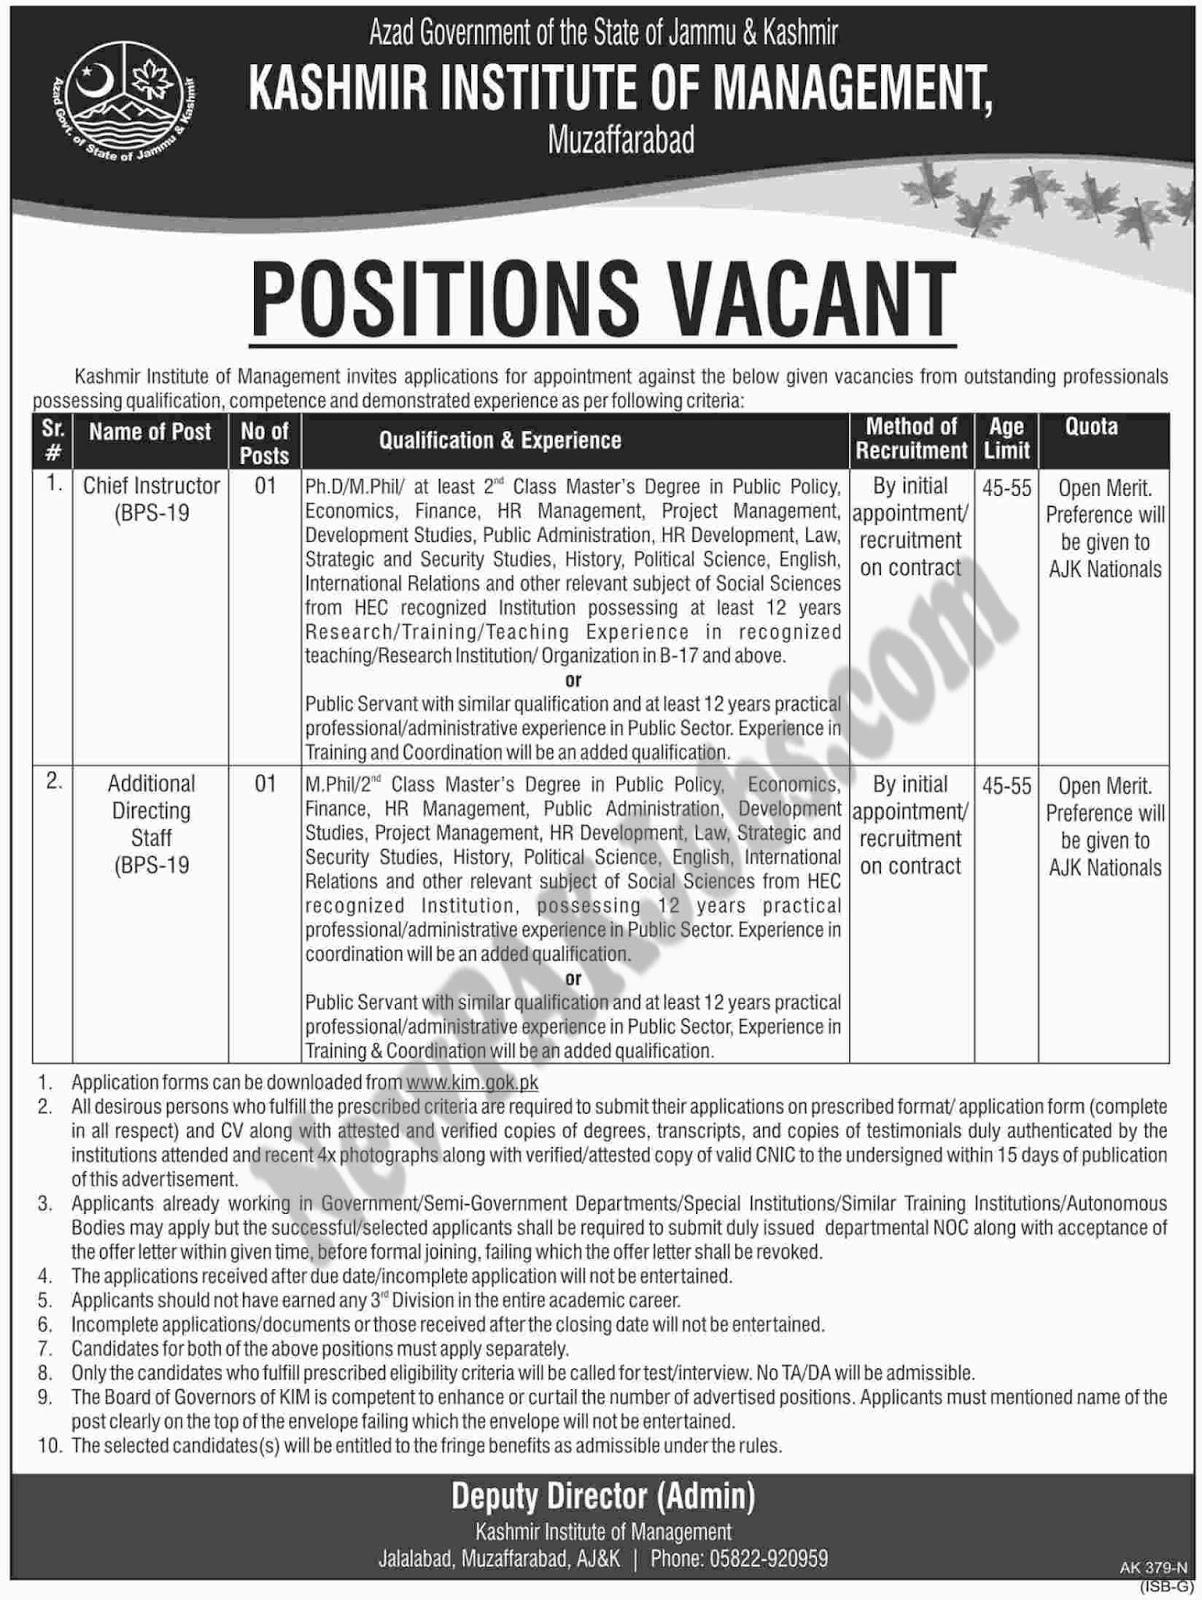 Latest Fresh Jobs Advertisement in AJK Kashmir Institute of Management, www.kim.gok.pk